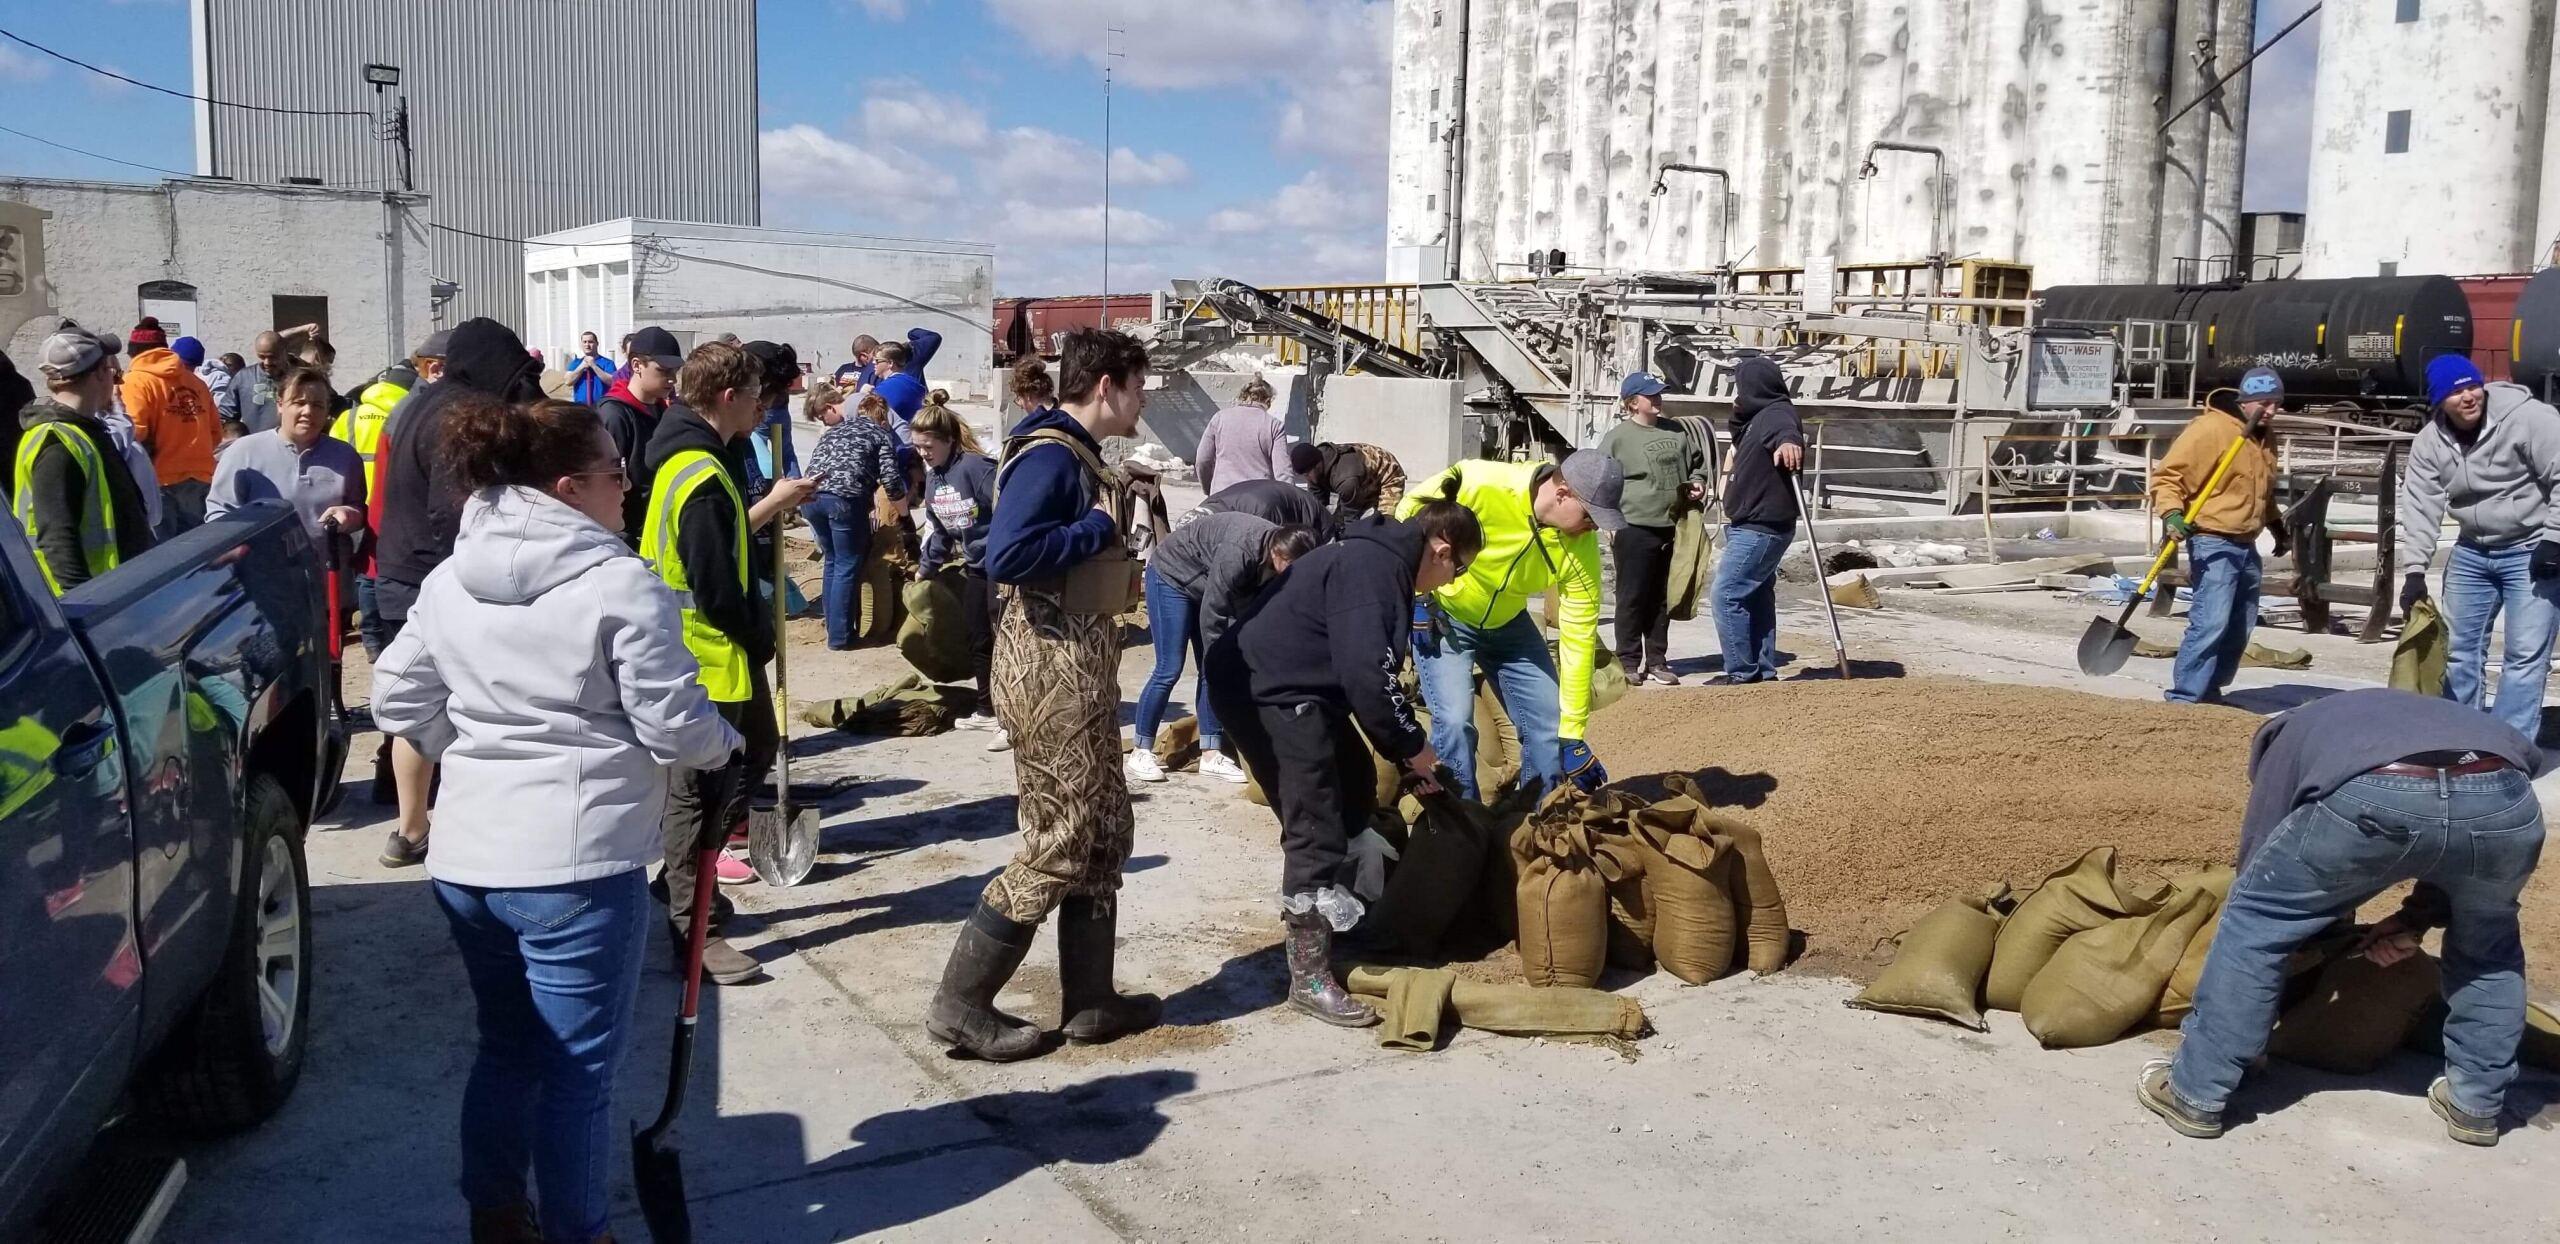 Fremont Flood Volunteers - Sandbags Being Filled and Set Up as a Barrier